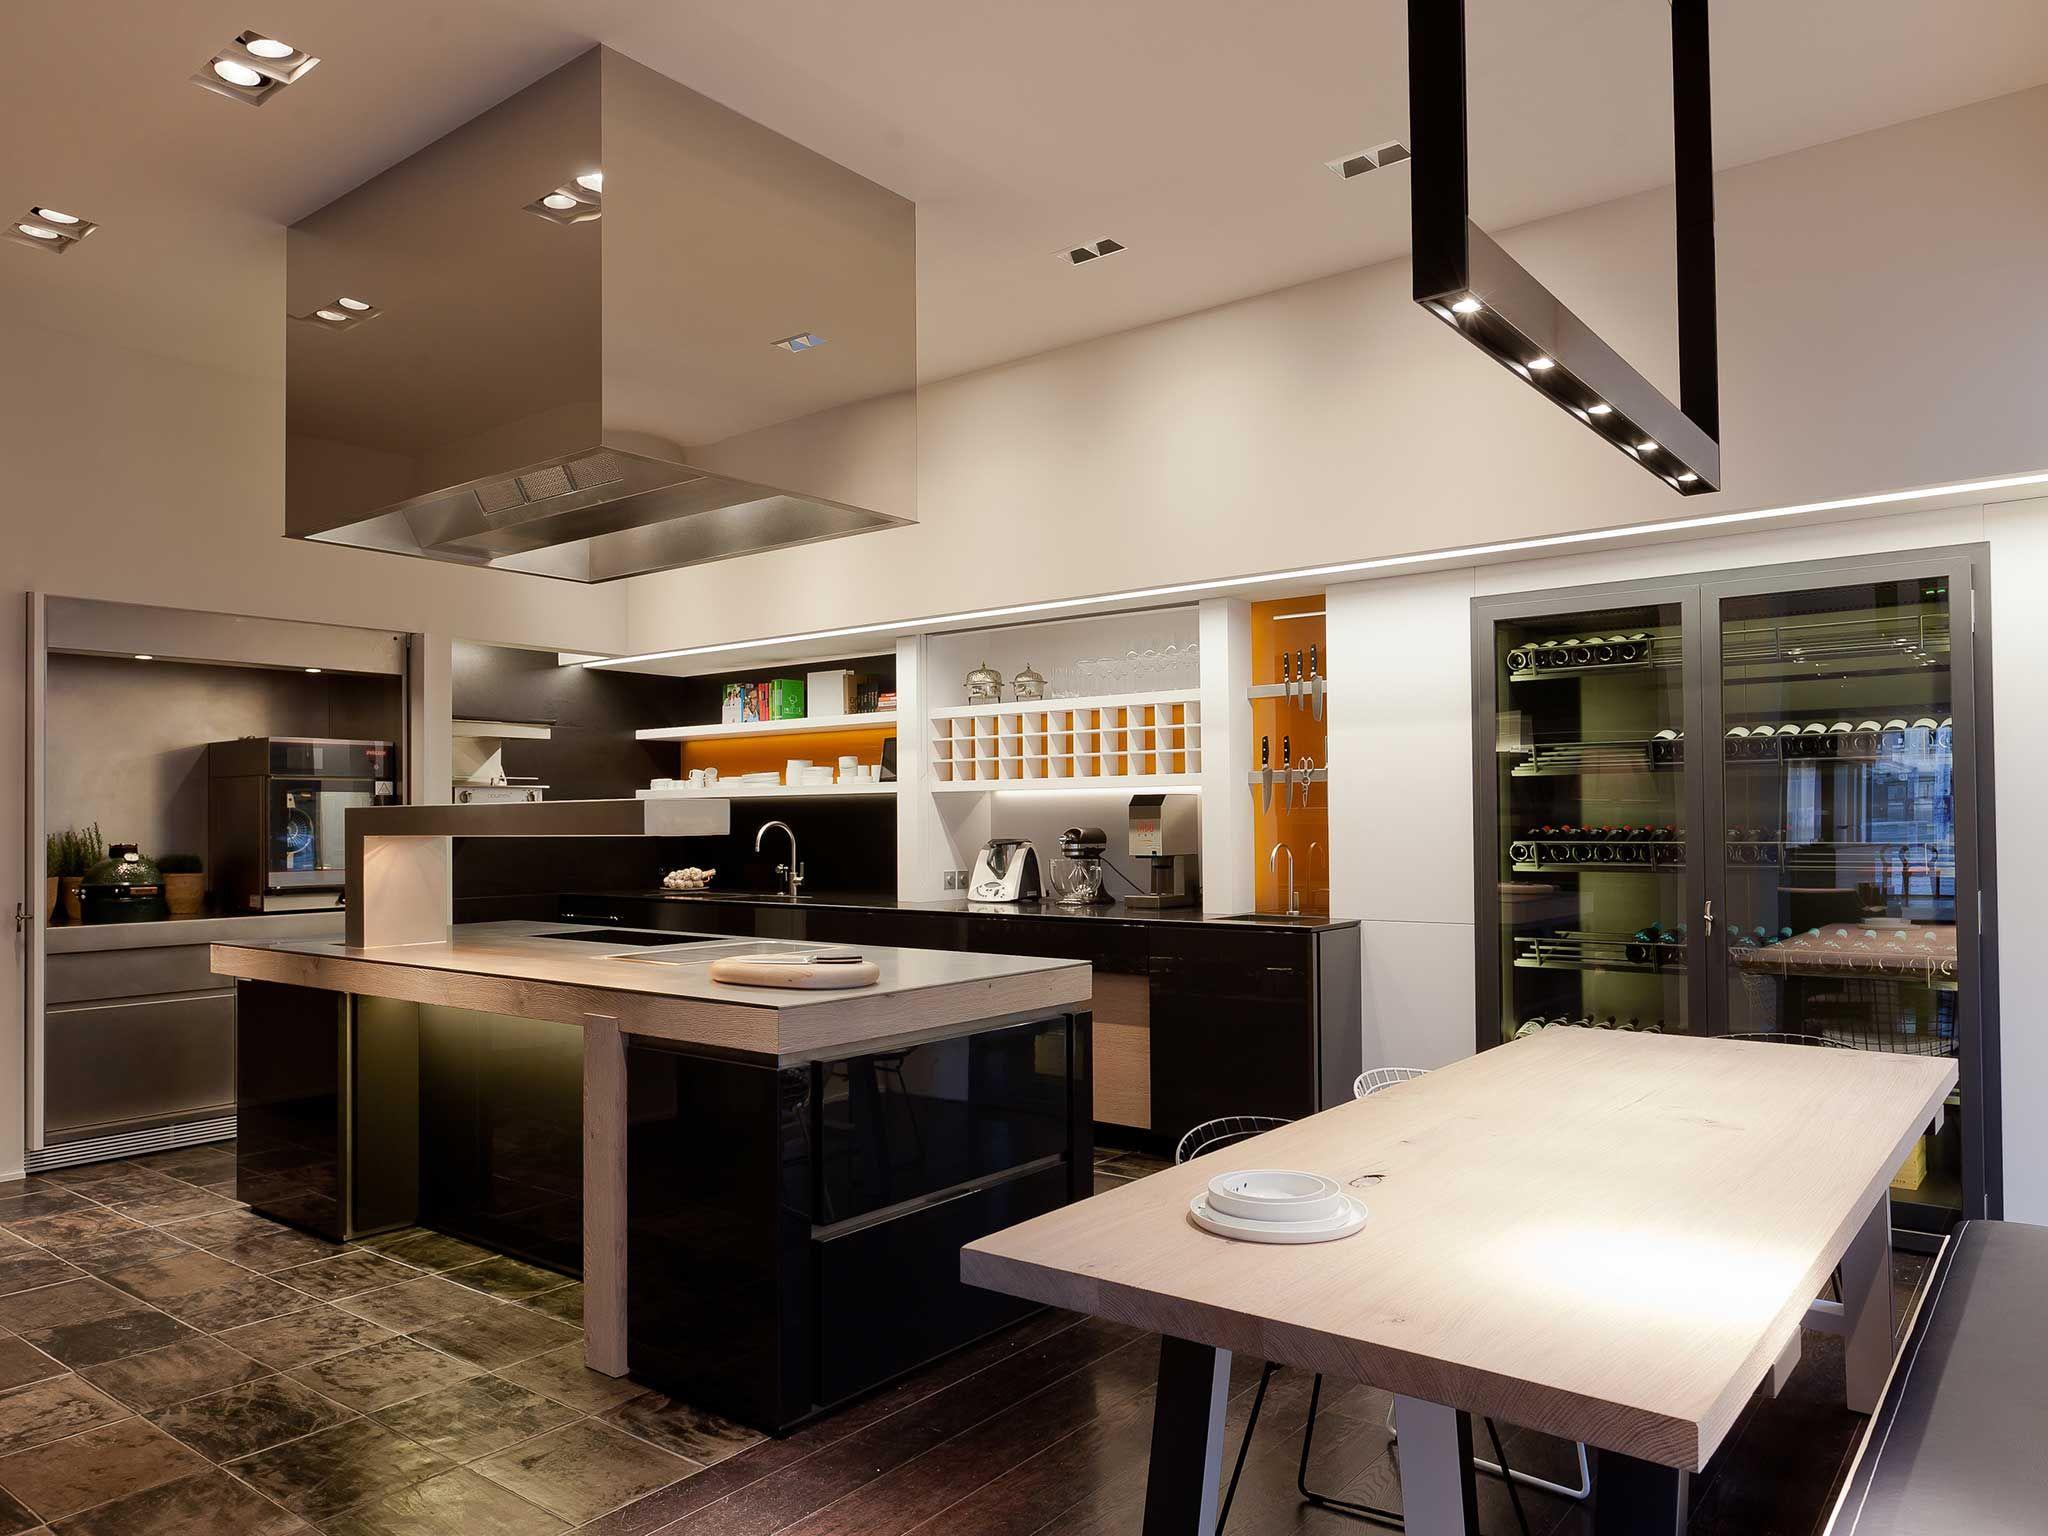 Obumex Professional Kitchen Bespoke Chef At Home Sergio Herman Architect Design Modern Kitchen Kitchen Design Obumex Kitchen